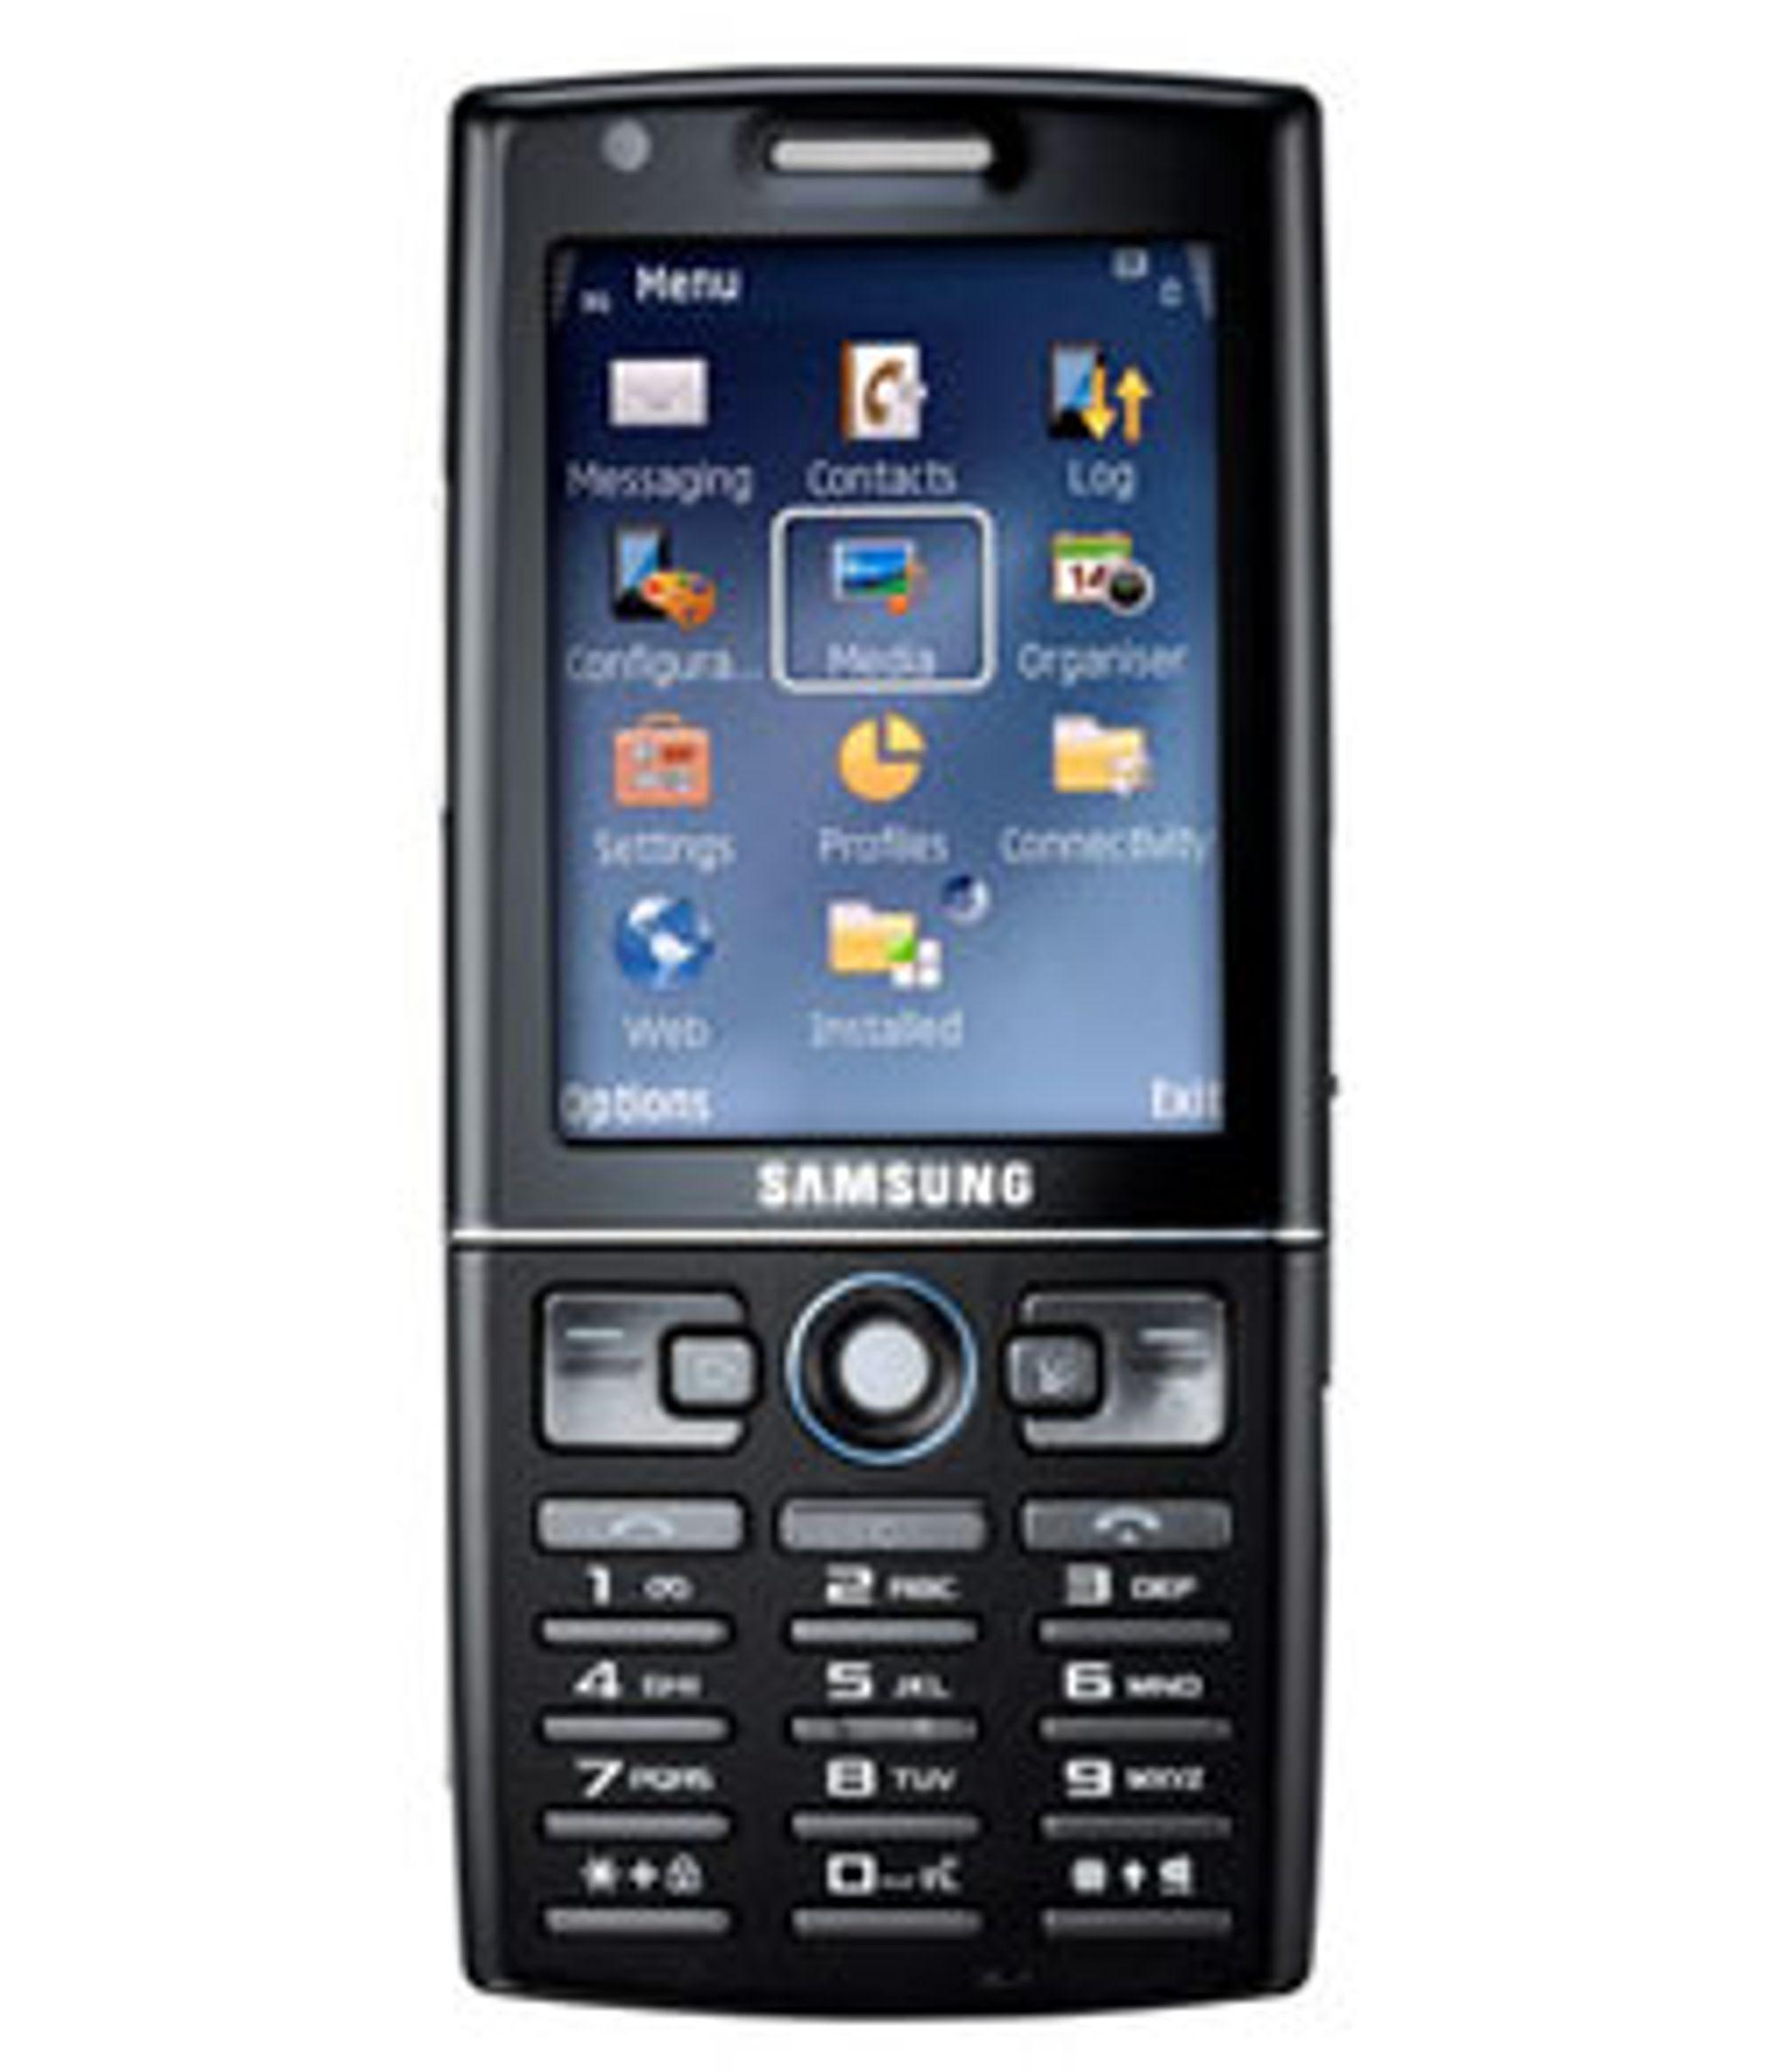 Samsung I550 har samme menysystem som Nokias smarttelefoner.